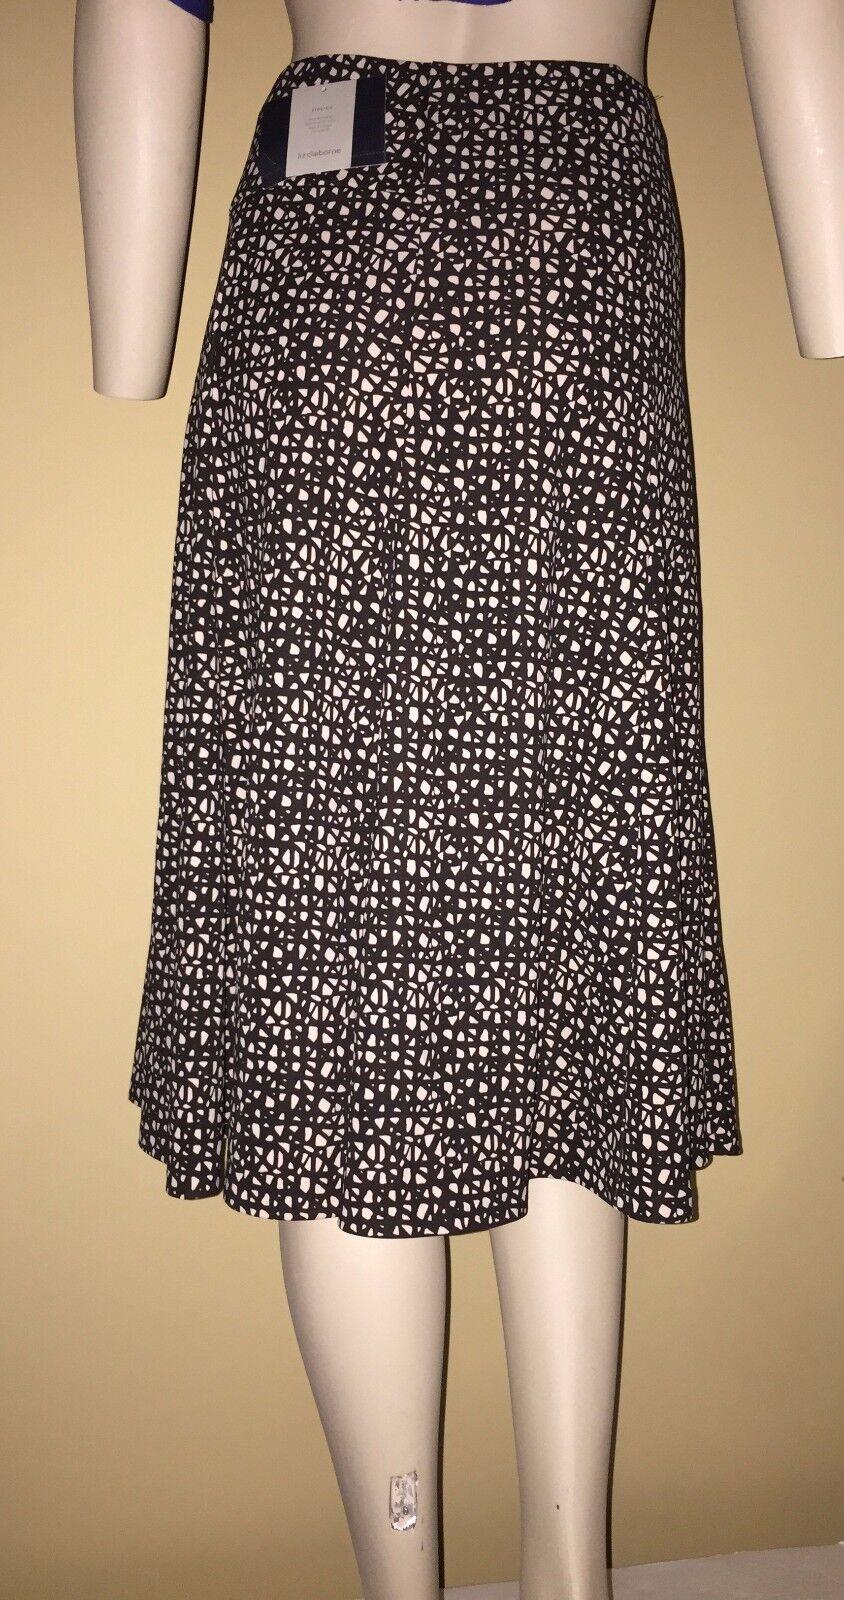 Liz Claiborne Sandstone Trail Print Brown Ivory Paneled A-Line Stretch Skirt XL